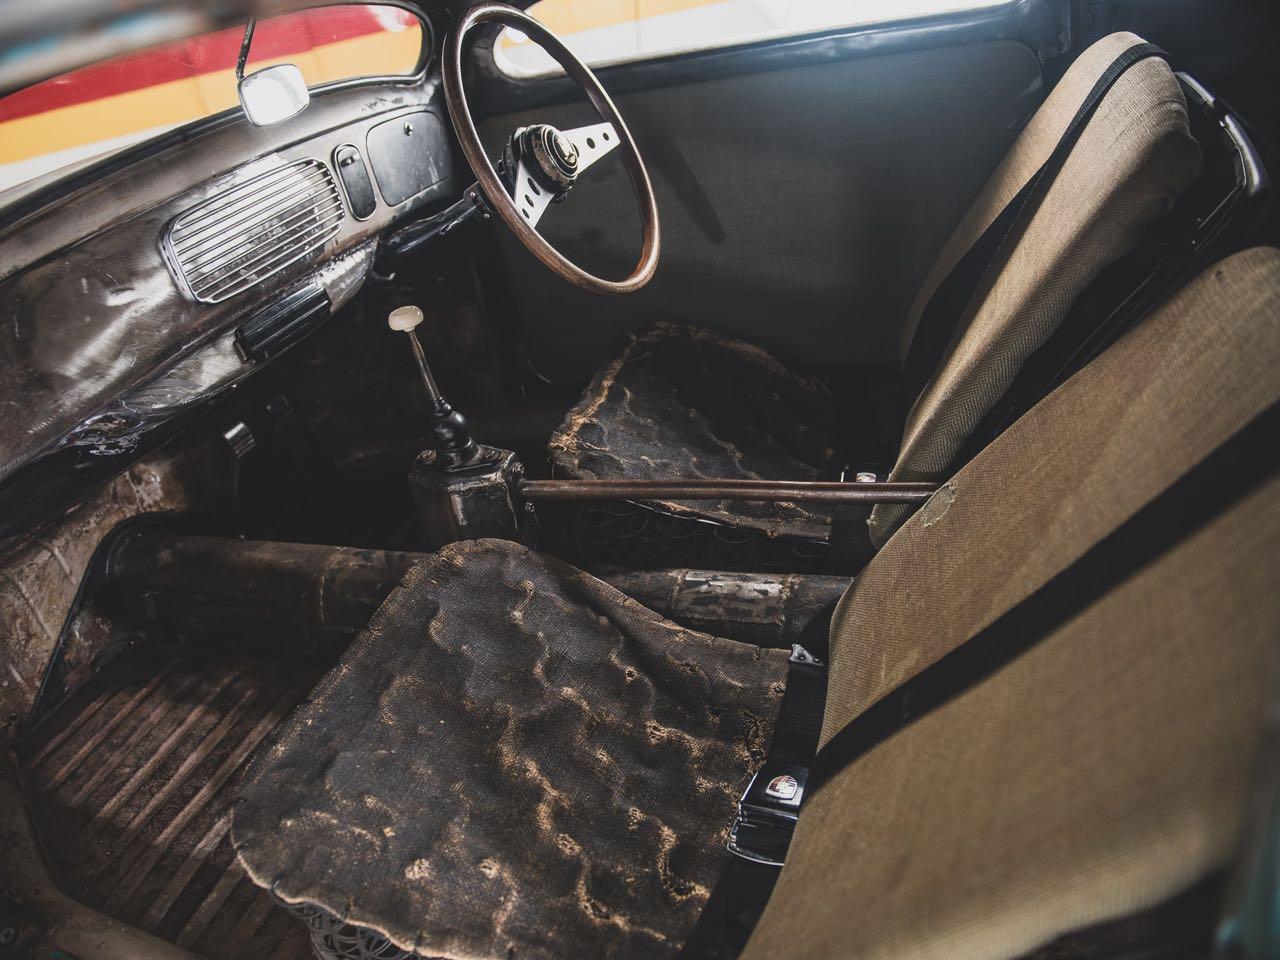 "'56 VW Beetle Outlaw ""Death"" by Franz Muhr - Heavy Metal ! 15"